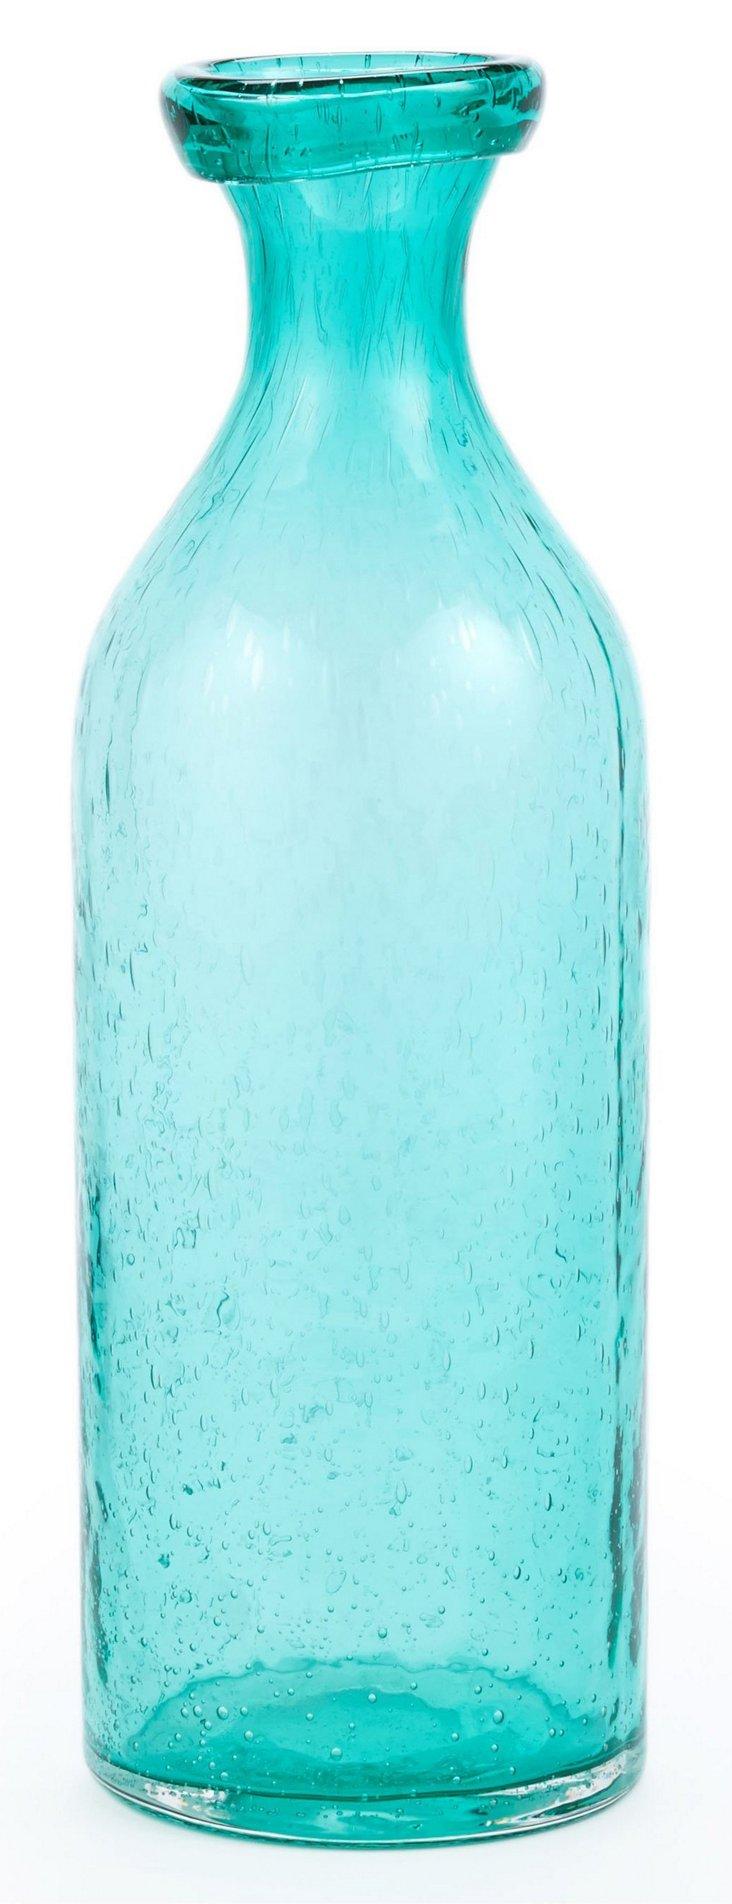 "12"" Bubble Bottle, Aqua"